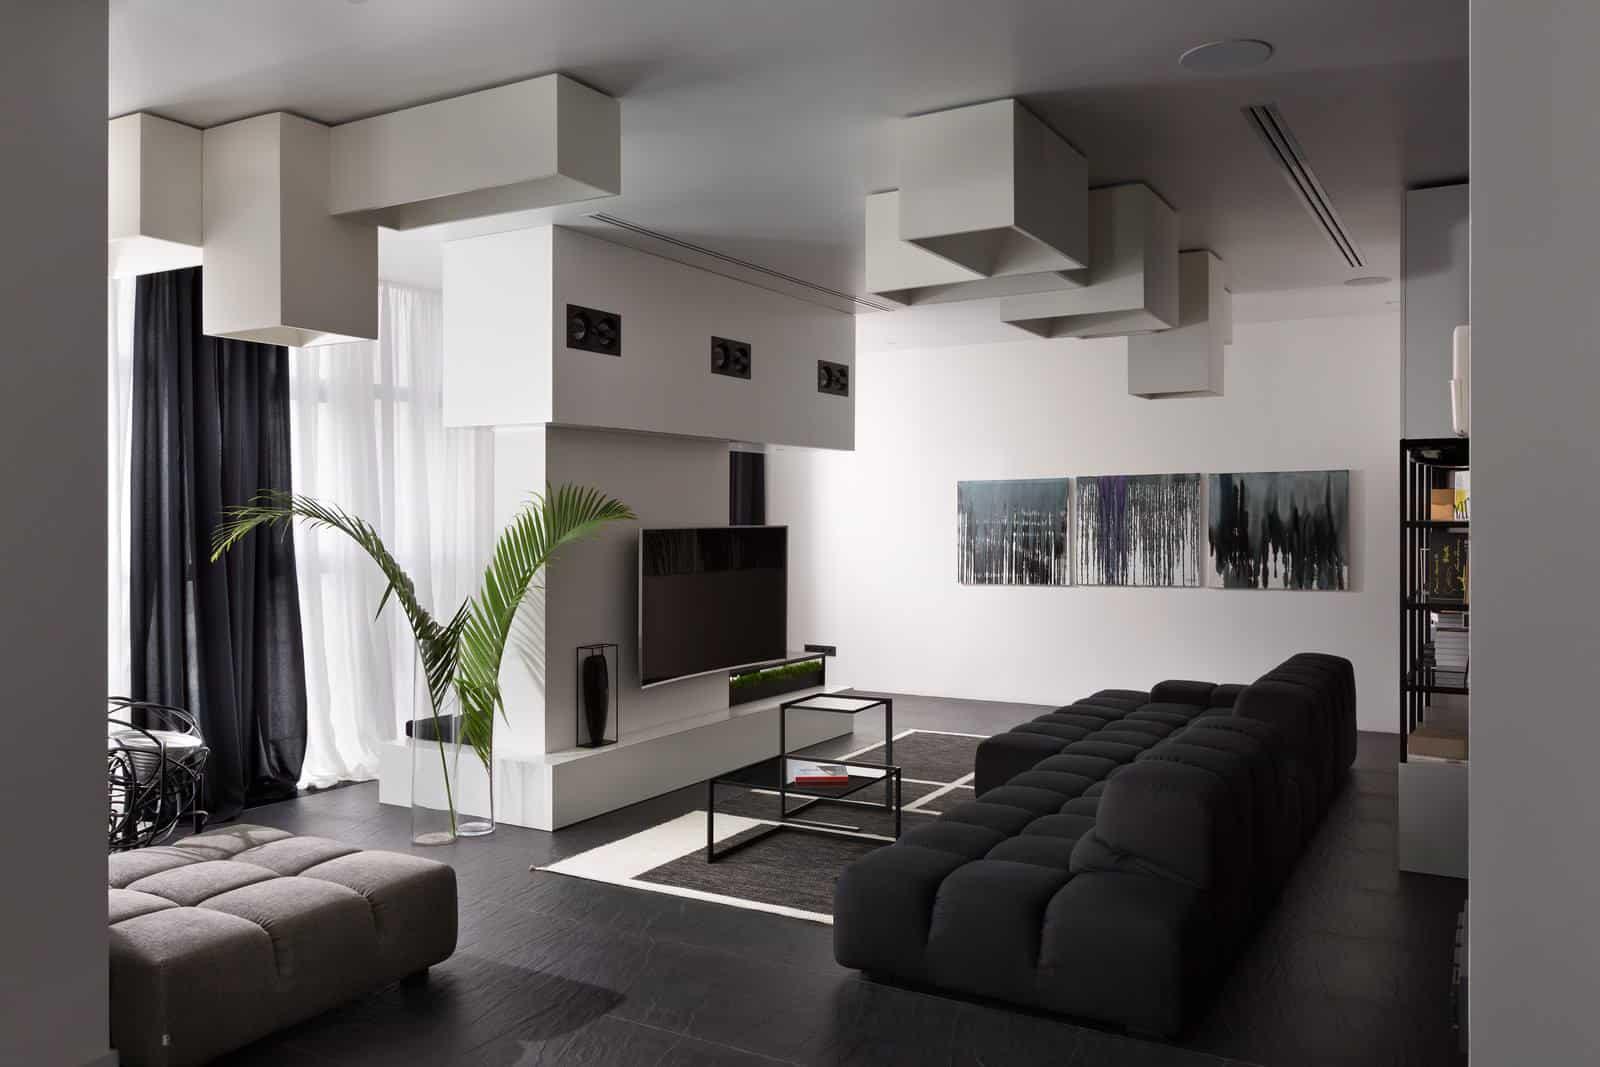 thiet-ke-noi-that-chung-cu-mai-dich-1 Thiết kế nội thất chung cư Mai Dịch - A. Sinh